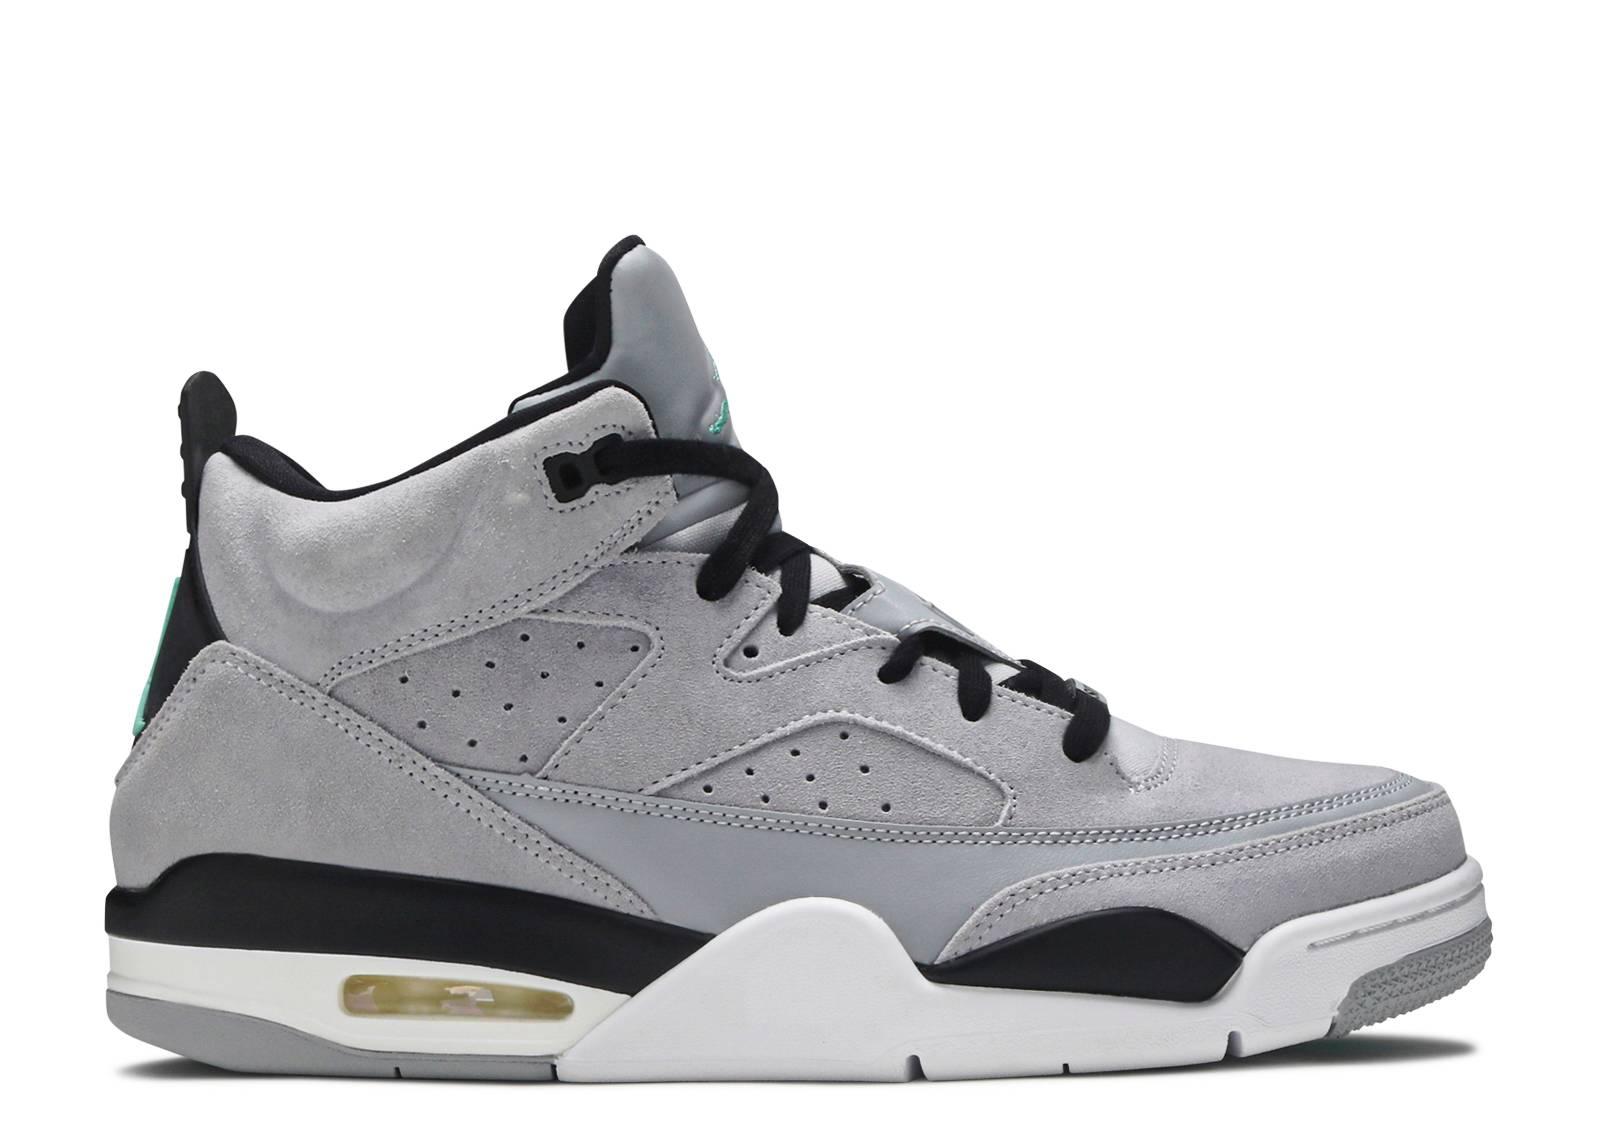 93082f852699 Jordan Son Of Low - Air Jordan - 580603 027 - wolf-grey   emerald rise  black